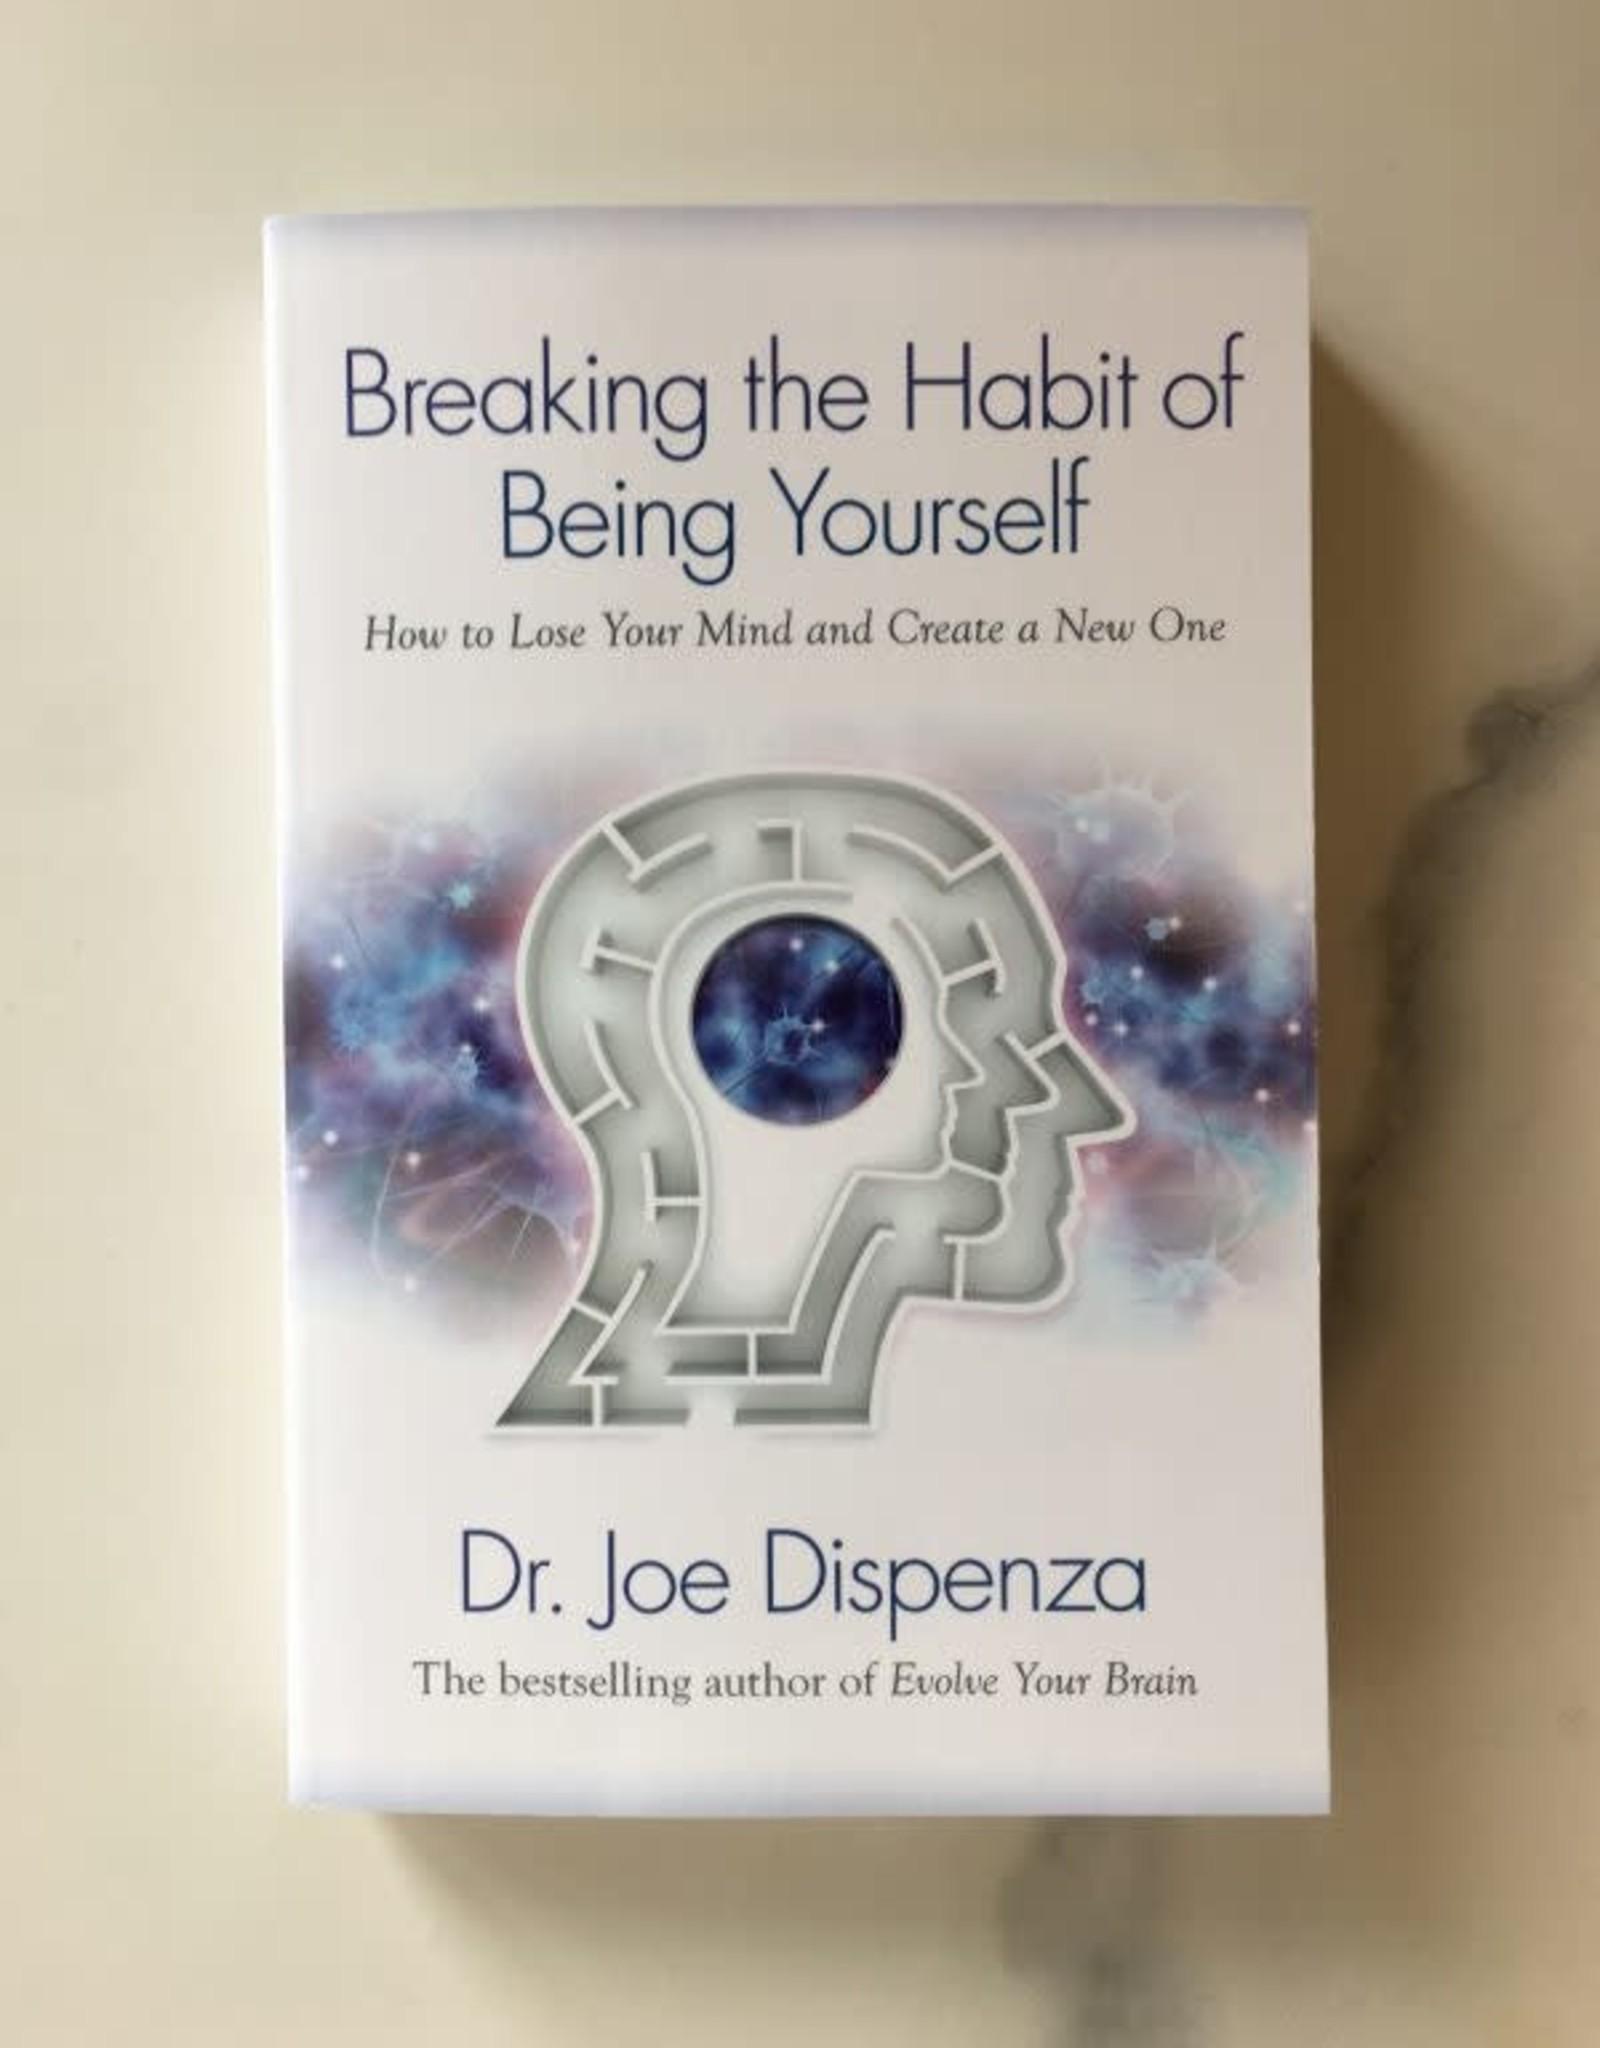 Dr. Joe Dispenza Breaking the Habit of Being Yourself by Dr. Joe Dispenza